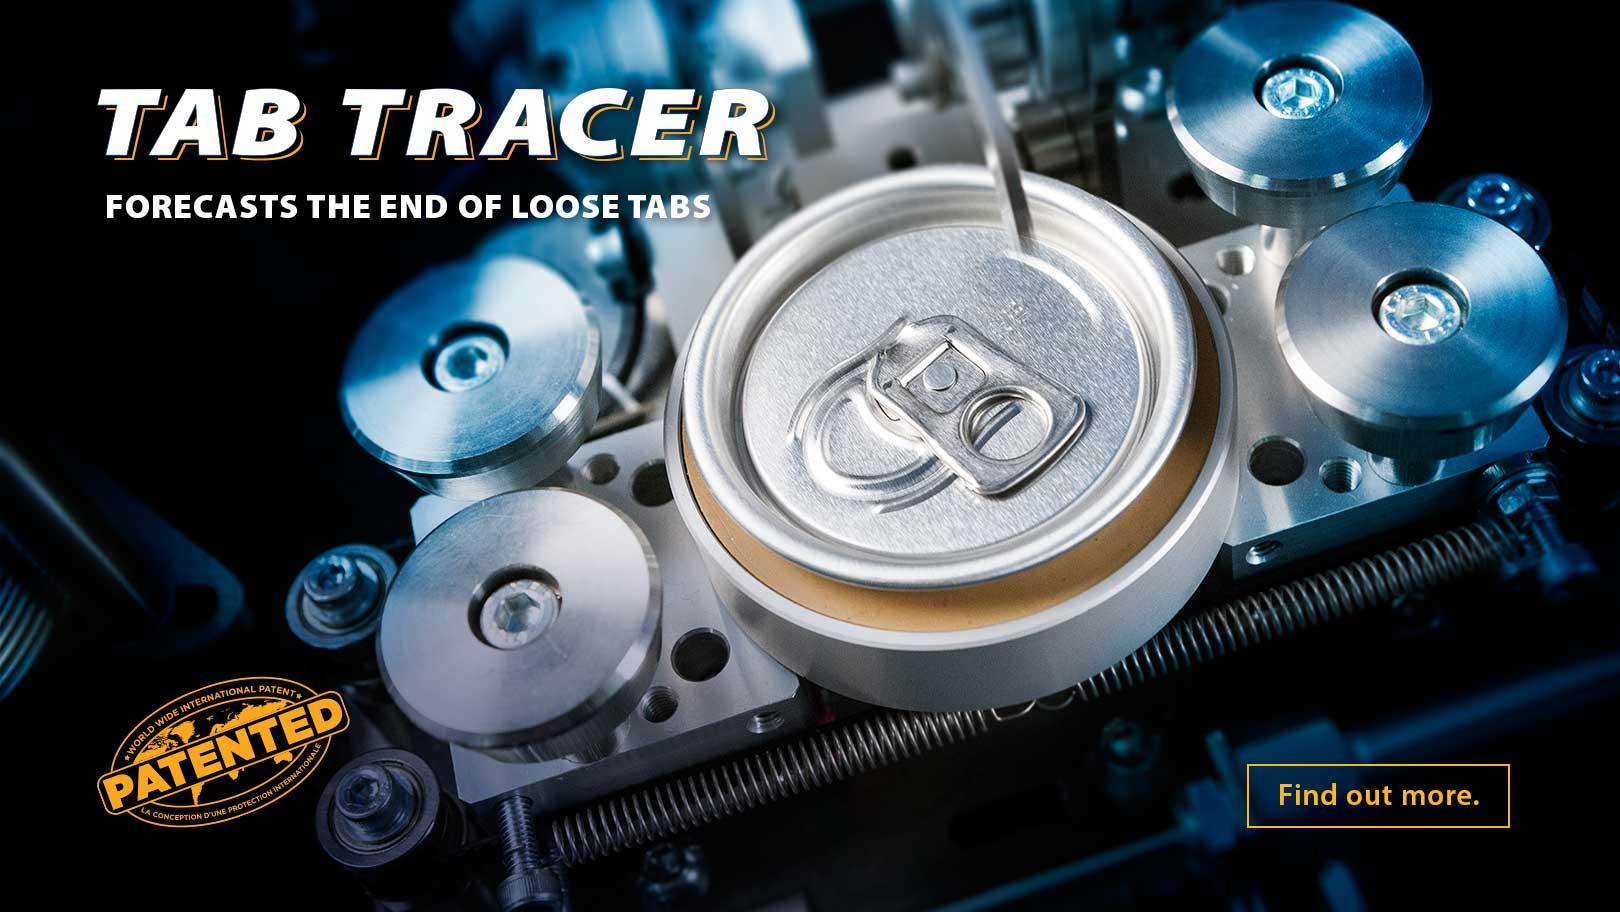 Versatile Technology Tab Tracer